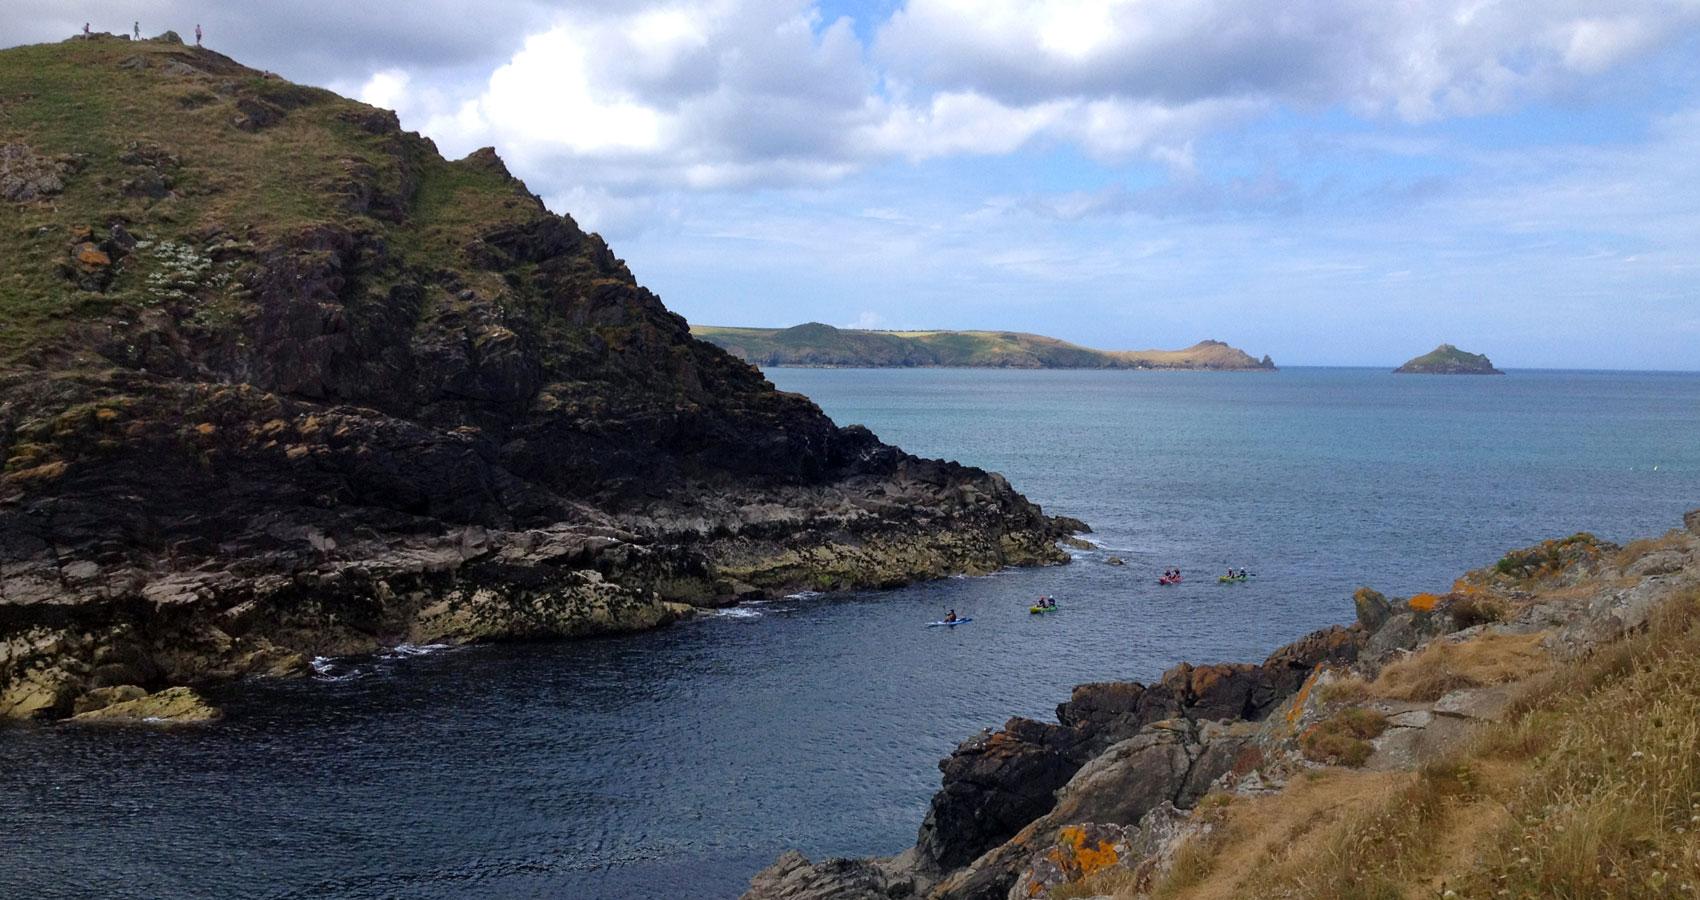 E.g. 'Kayak tours Cornwall'